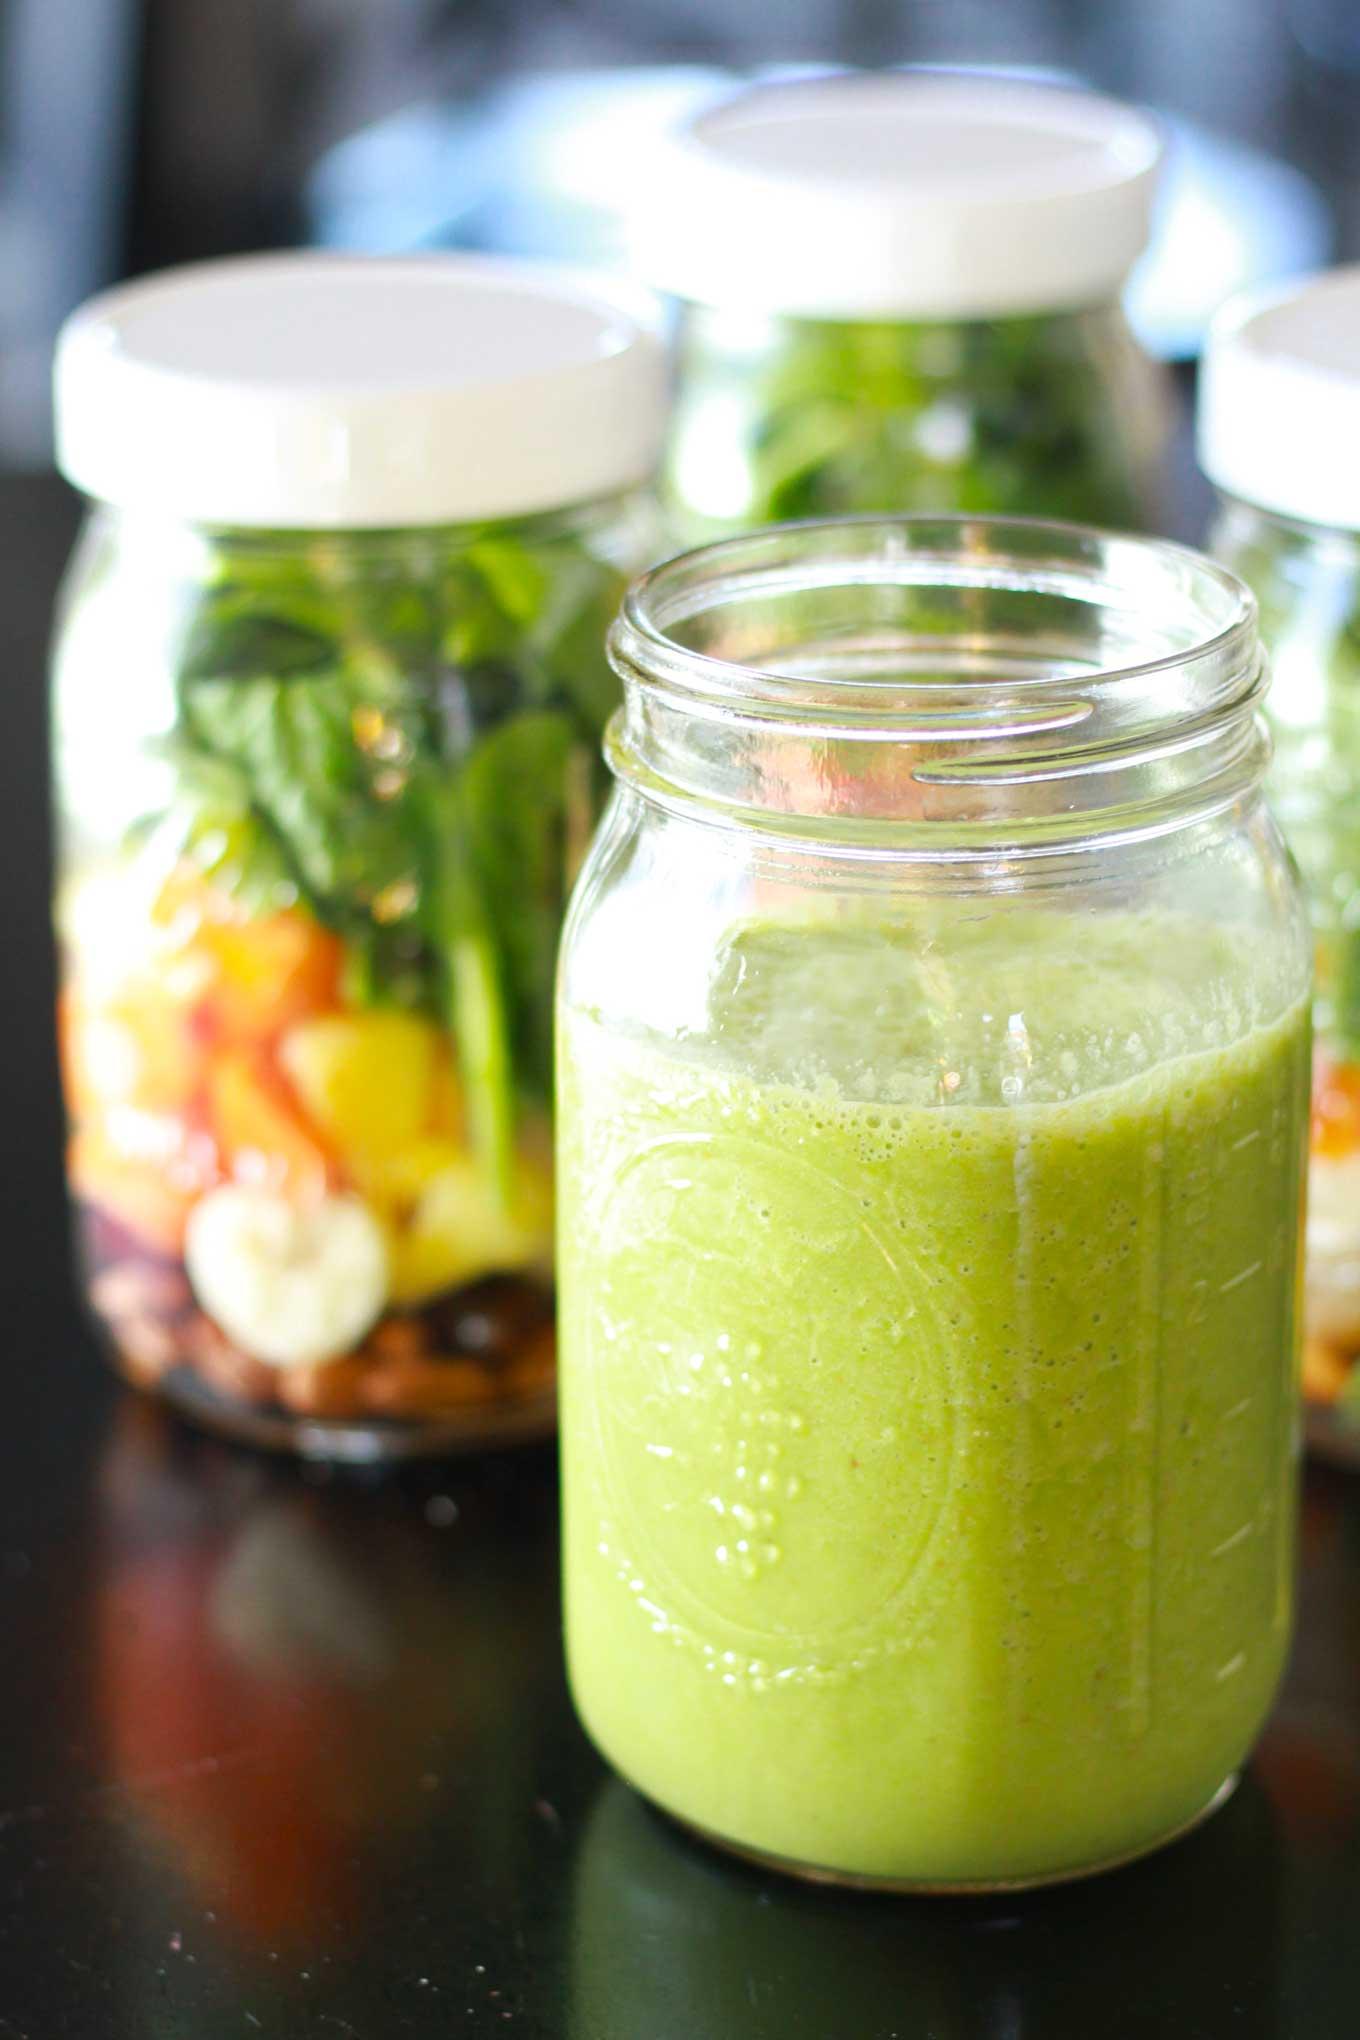 Green smoothie poured into quart size wide mouth mason jar | Vegan green smoothie recipe | https://passtheplants.com/